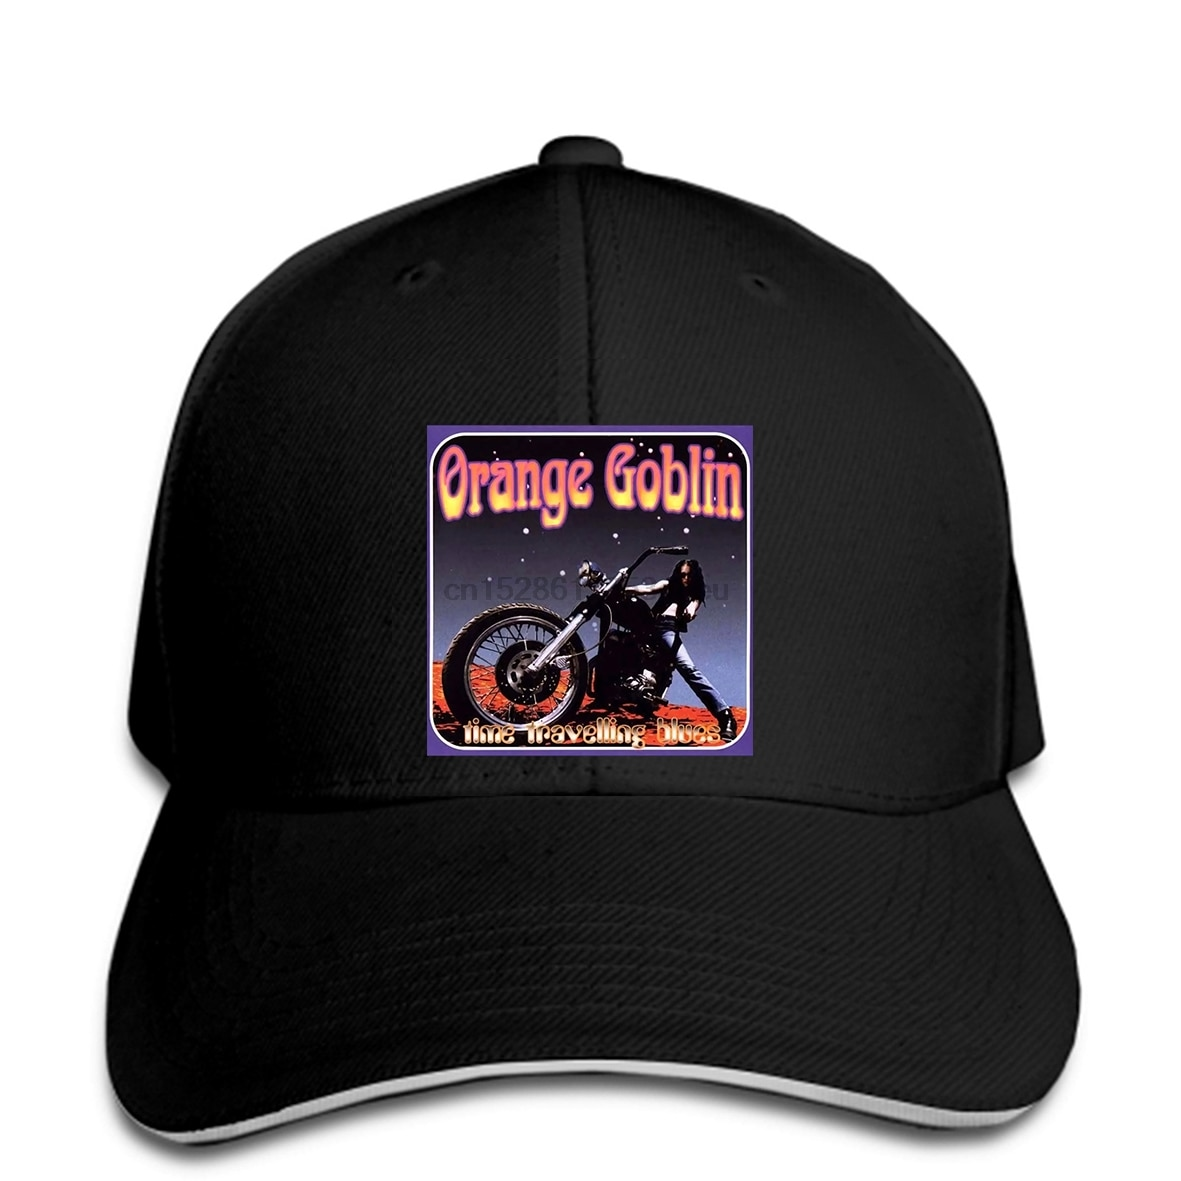 Nueva gorra de béisbol negra para hombre con banda de Rock Heavy Metal Goblin naranja, gorra de béisbol para hombre, gorra snapback con visera